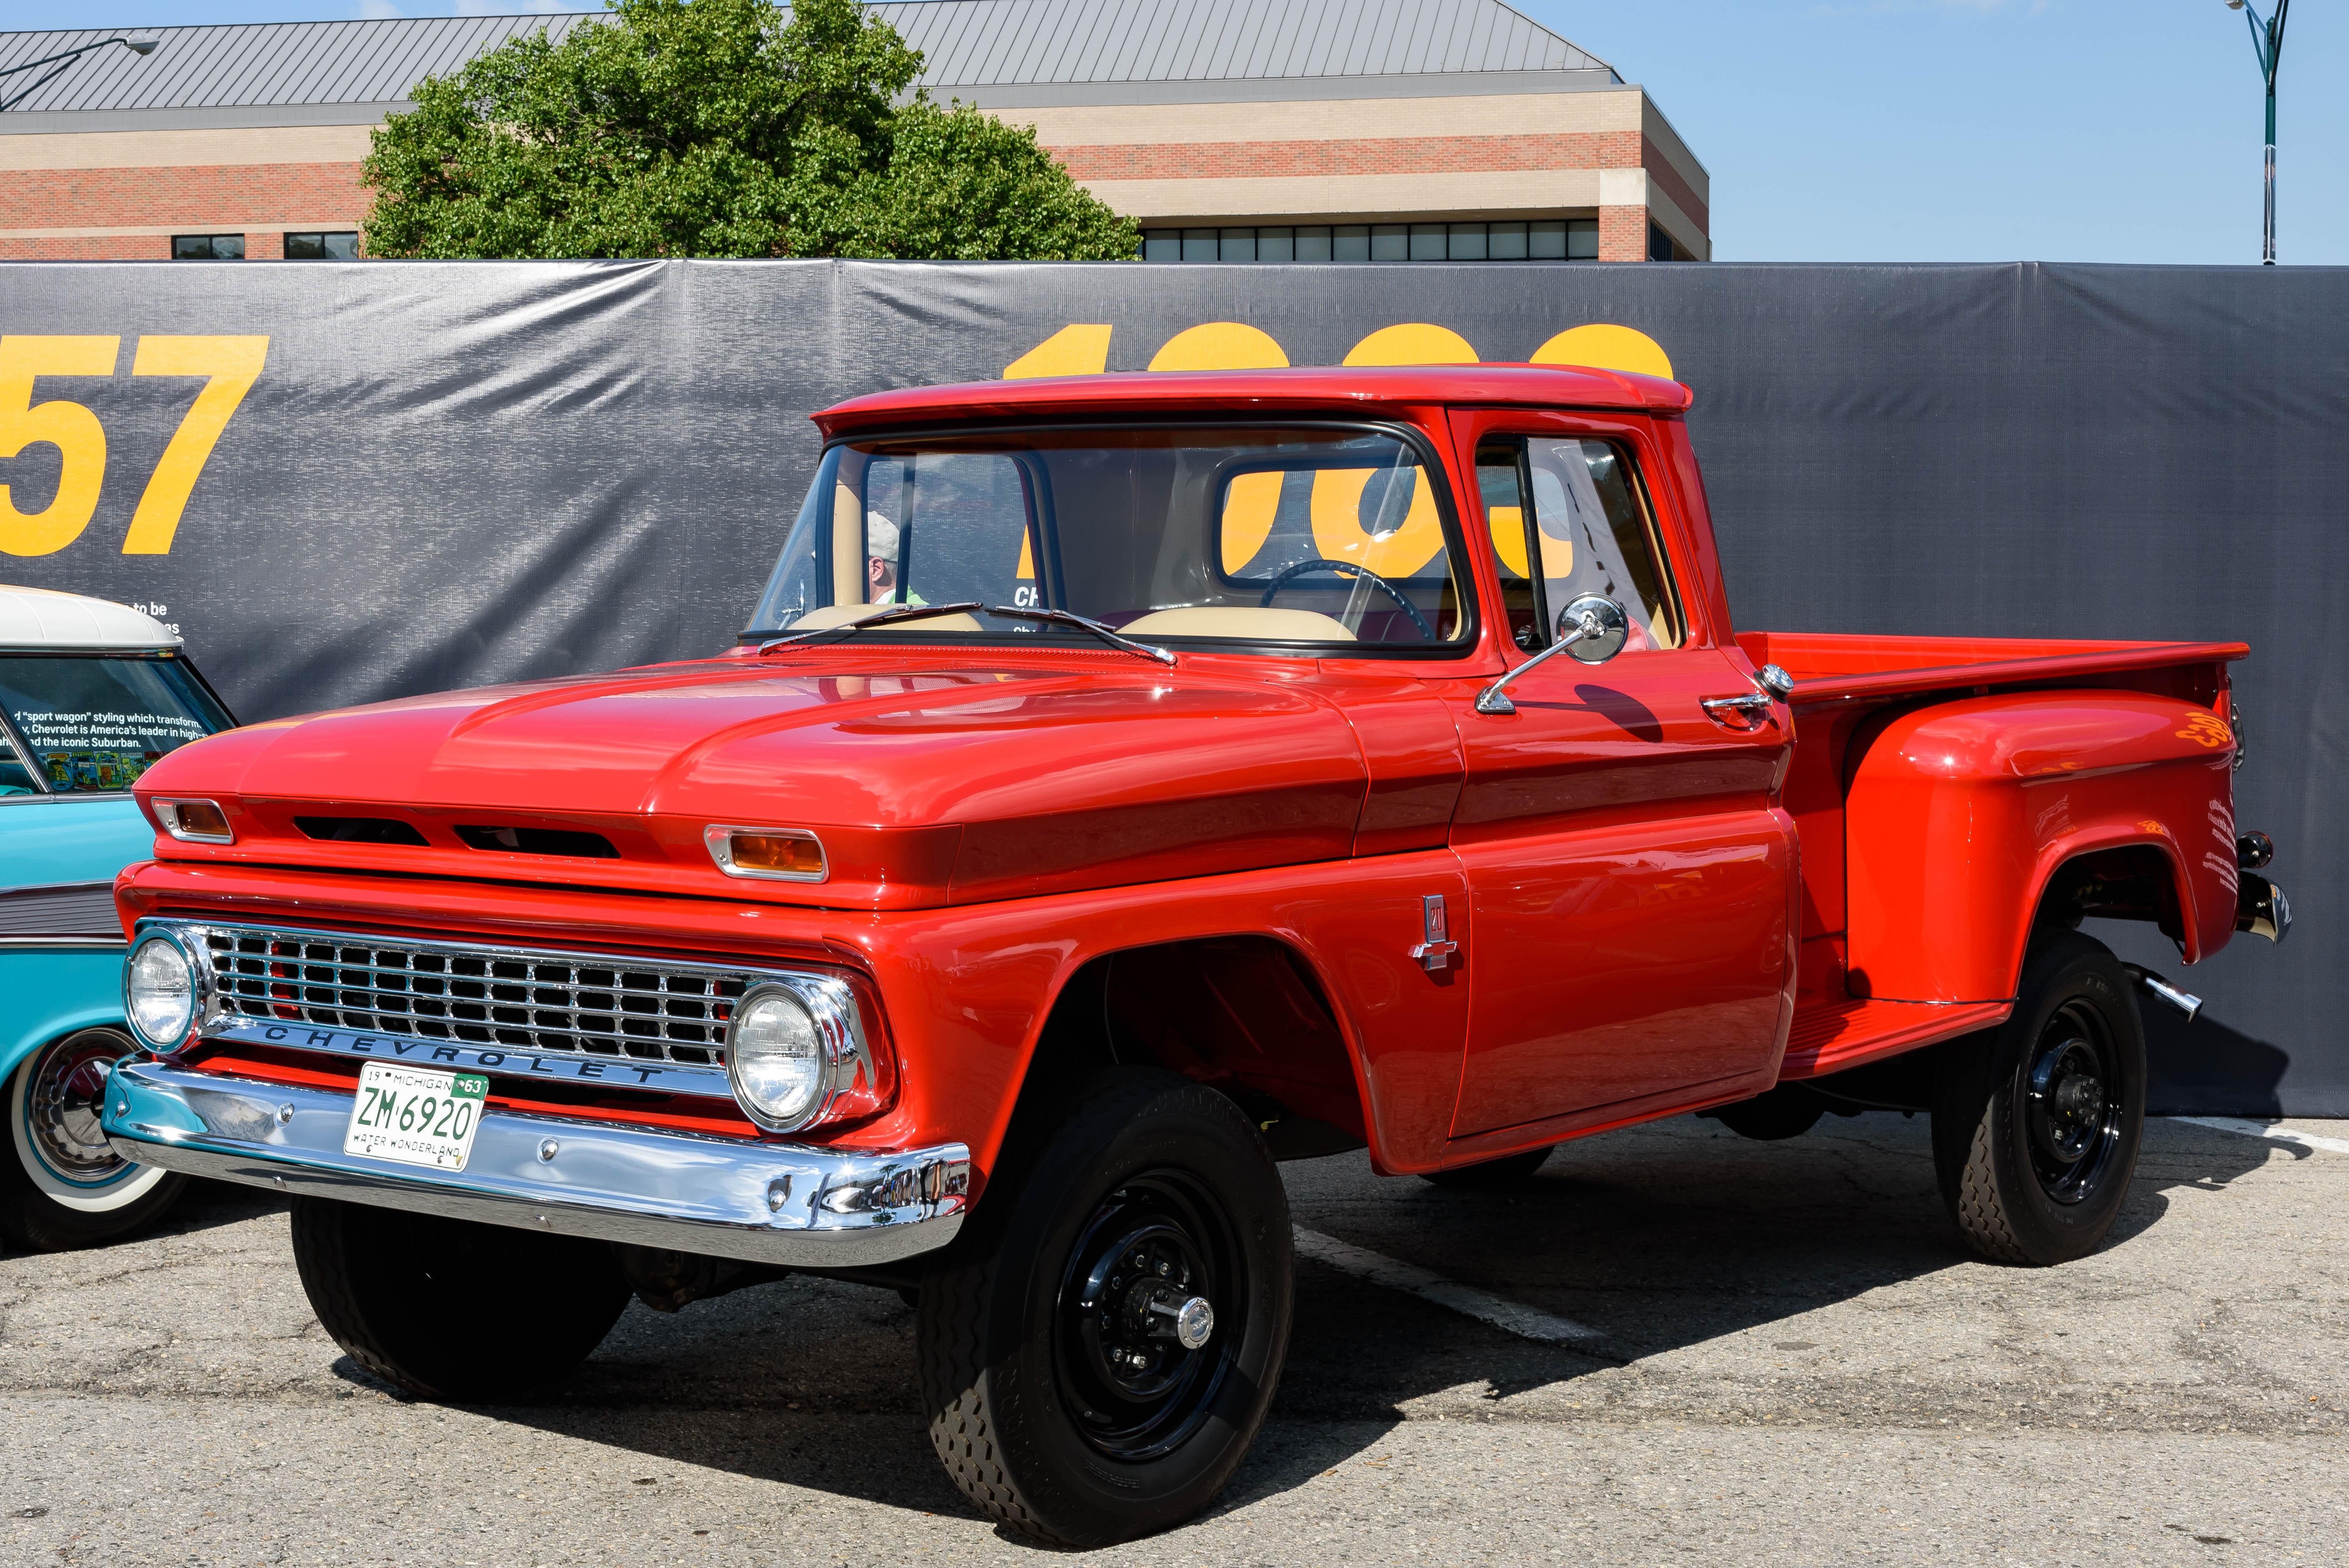 1963 Chevrolet, 2015, Nikon, Vehicle, Us, HQ Photo